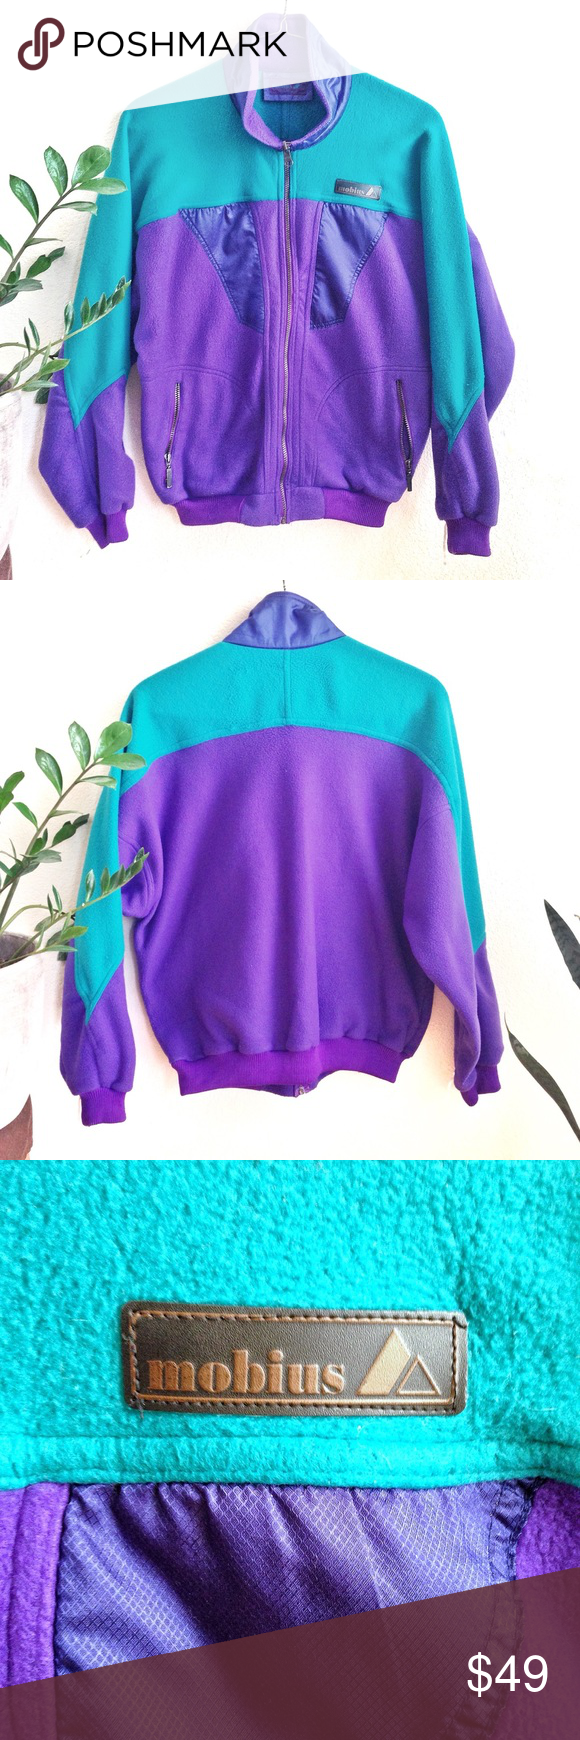 Vtg mobius s color block fleece gaper ski jacket